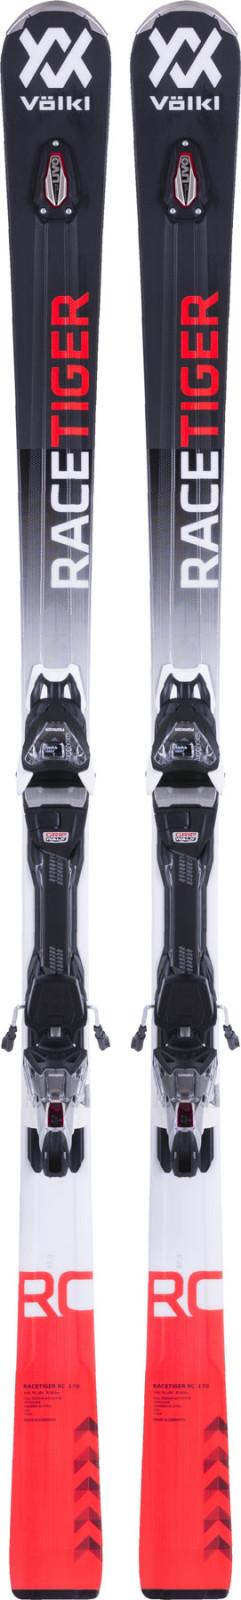 Völkl Racetiger RC Black + vMotion 12 GW